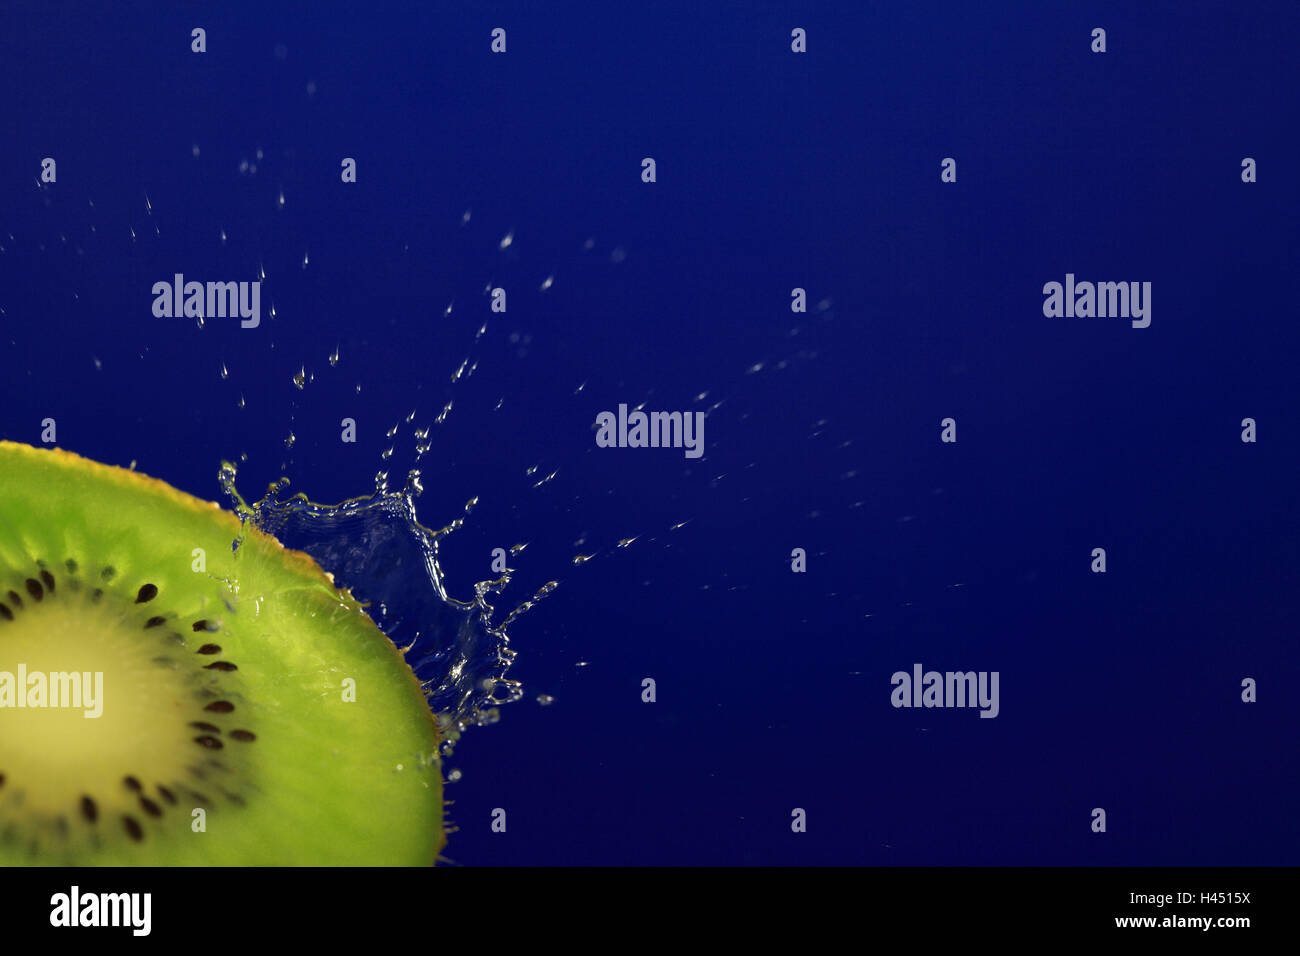 Kiwi, halves, drops water, - Stock Image